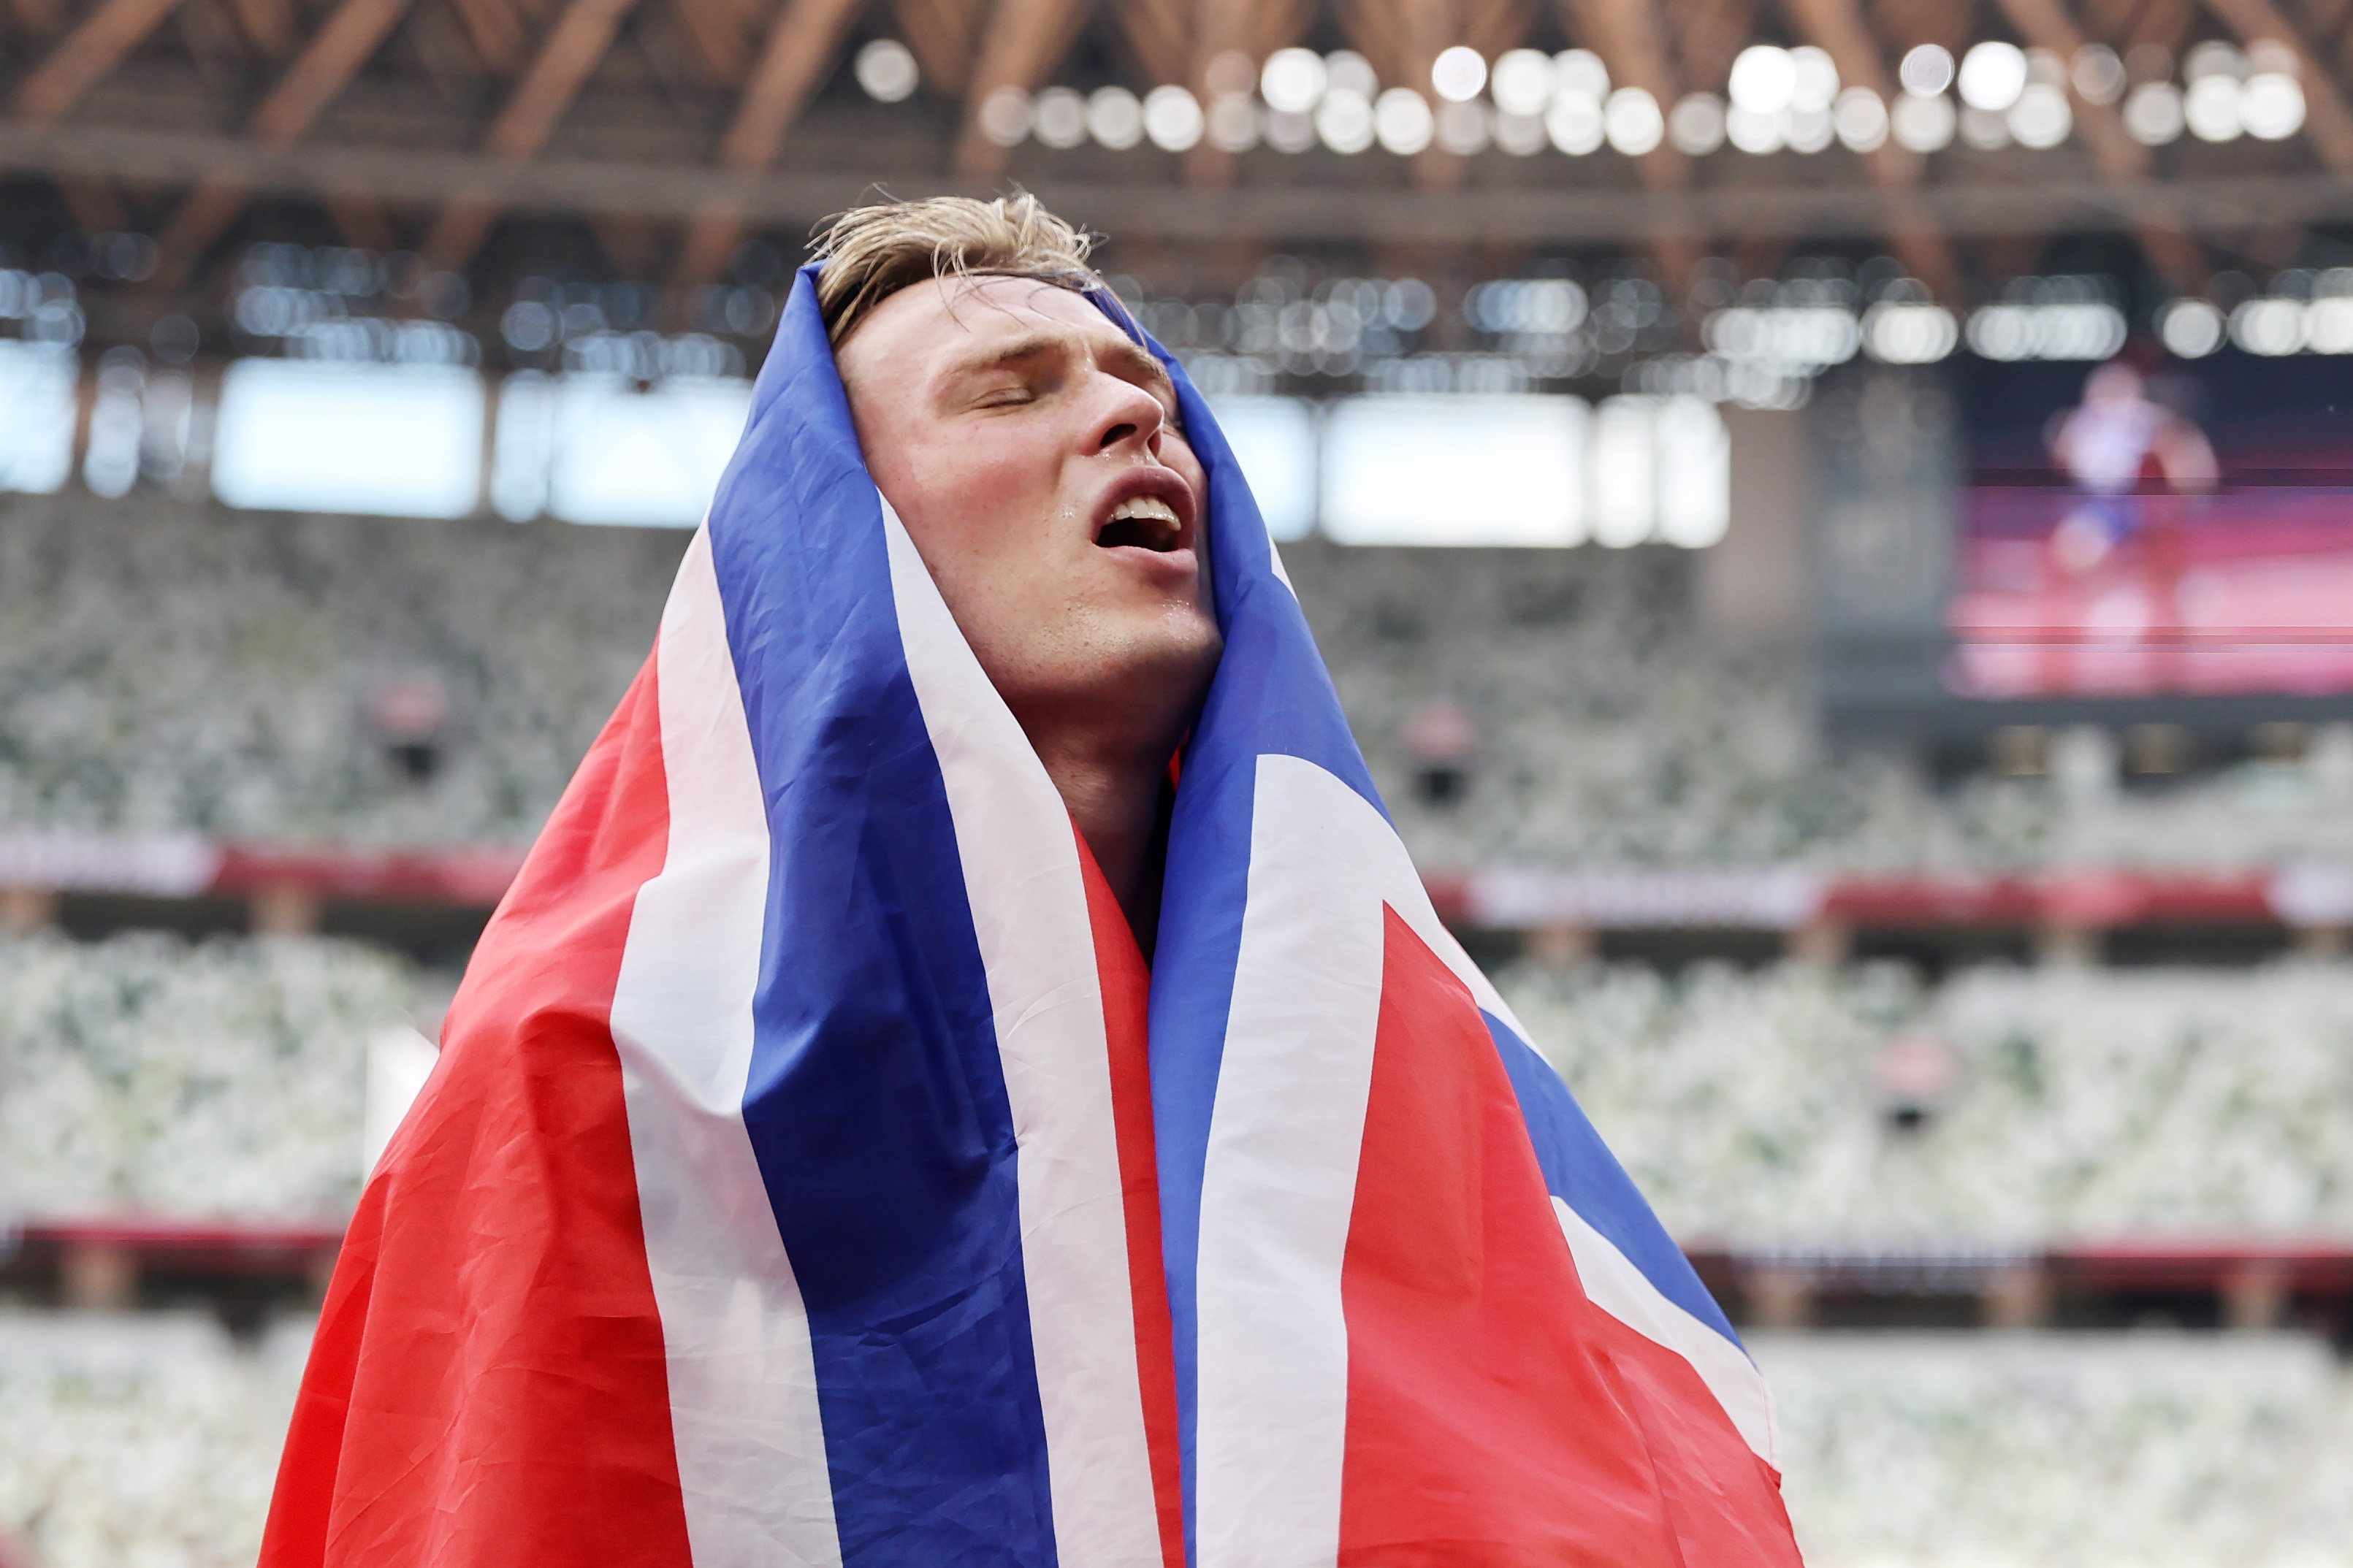 Norway's Karsten Warholm celebrates winning the gold medal in the 400 meters hurdles final on Tuesday.